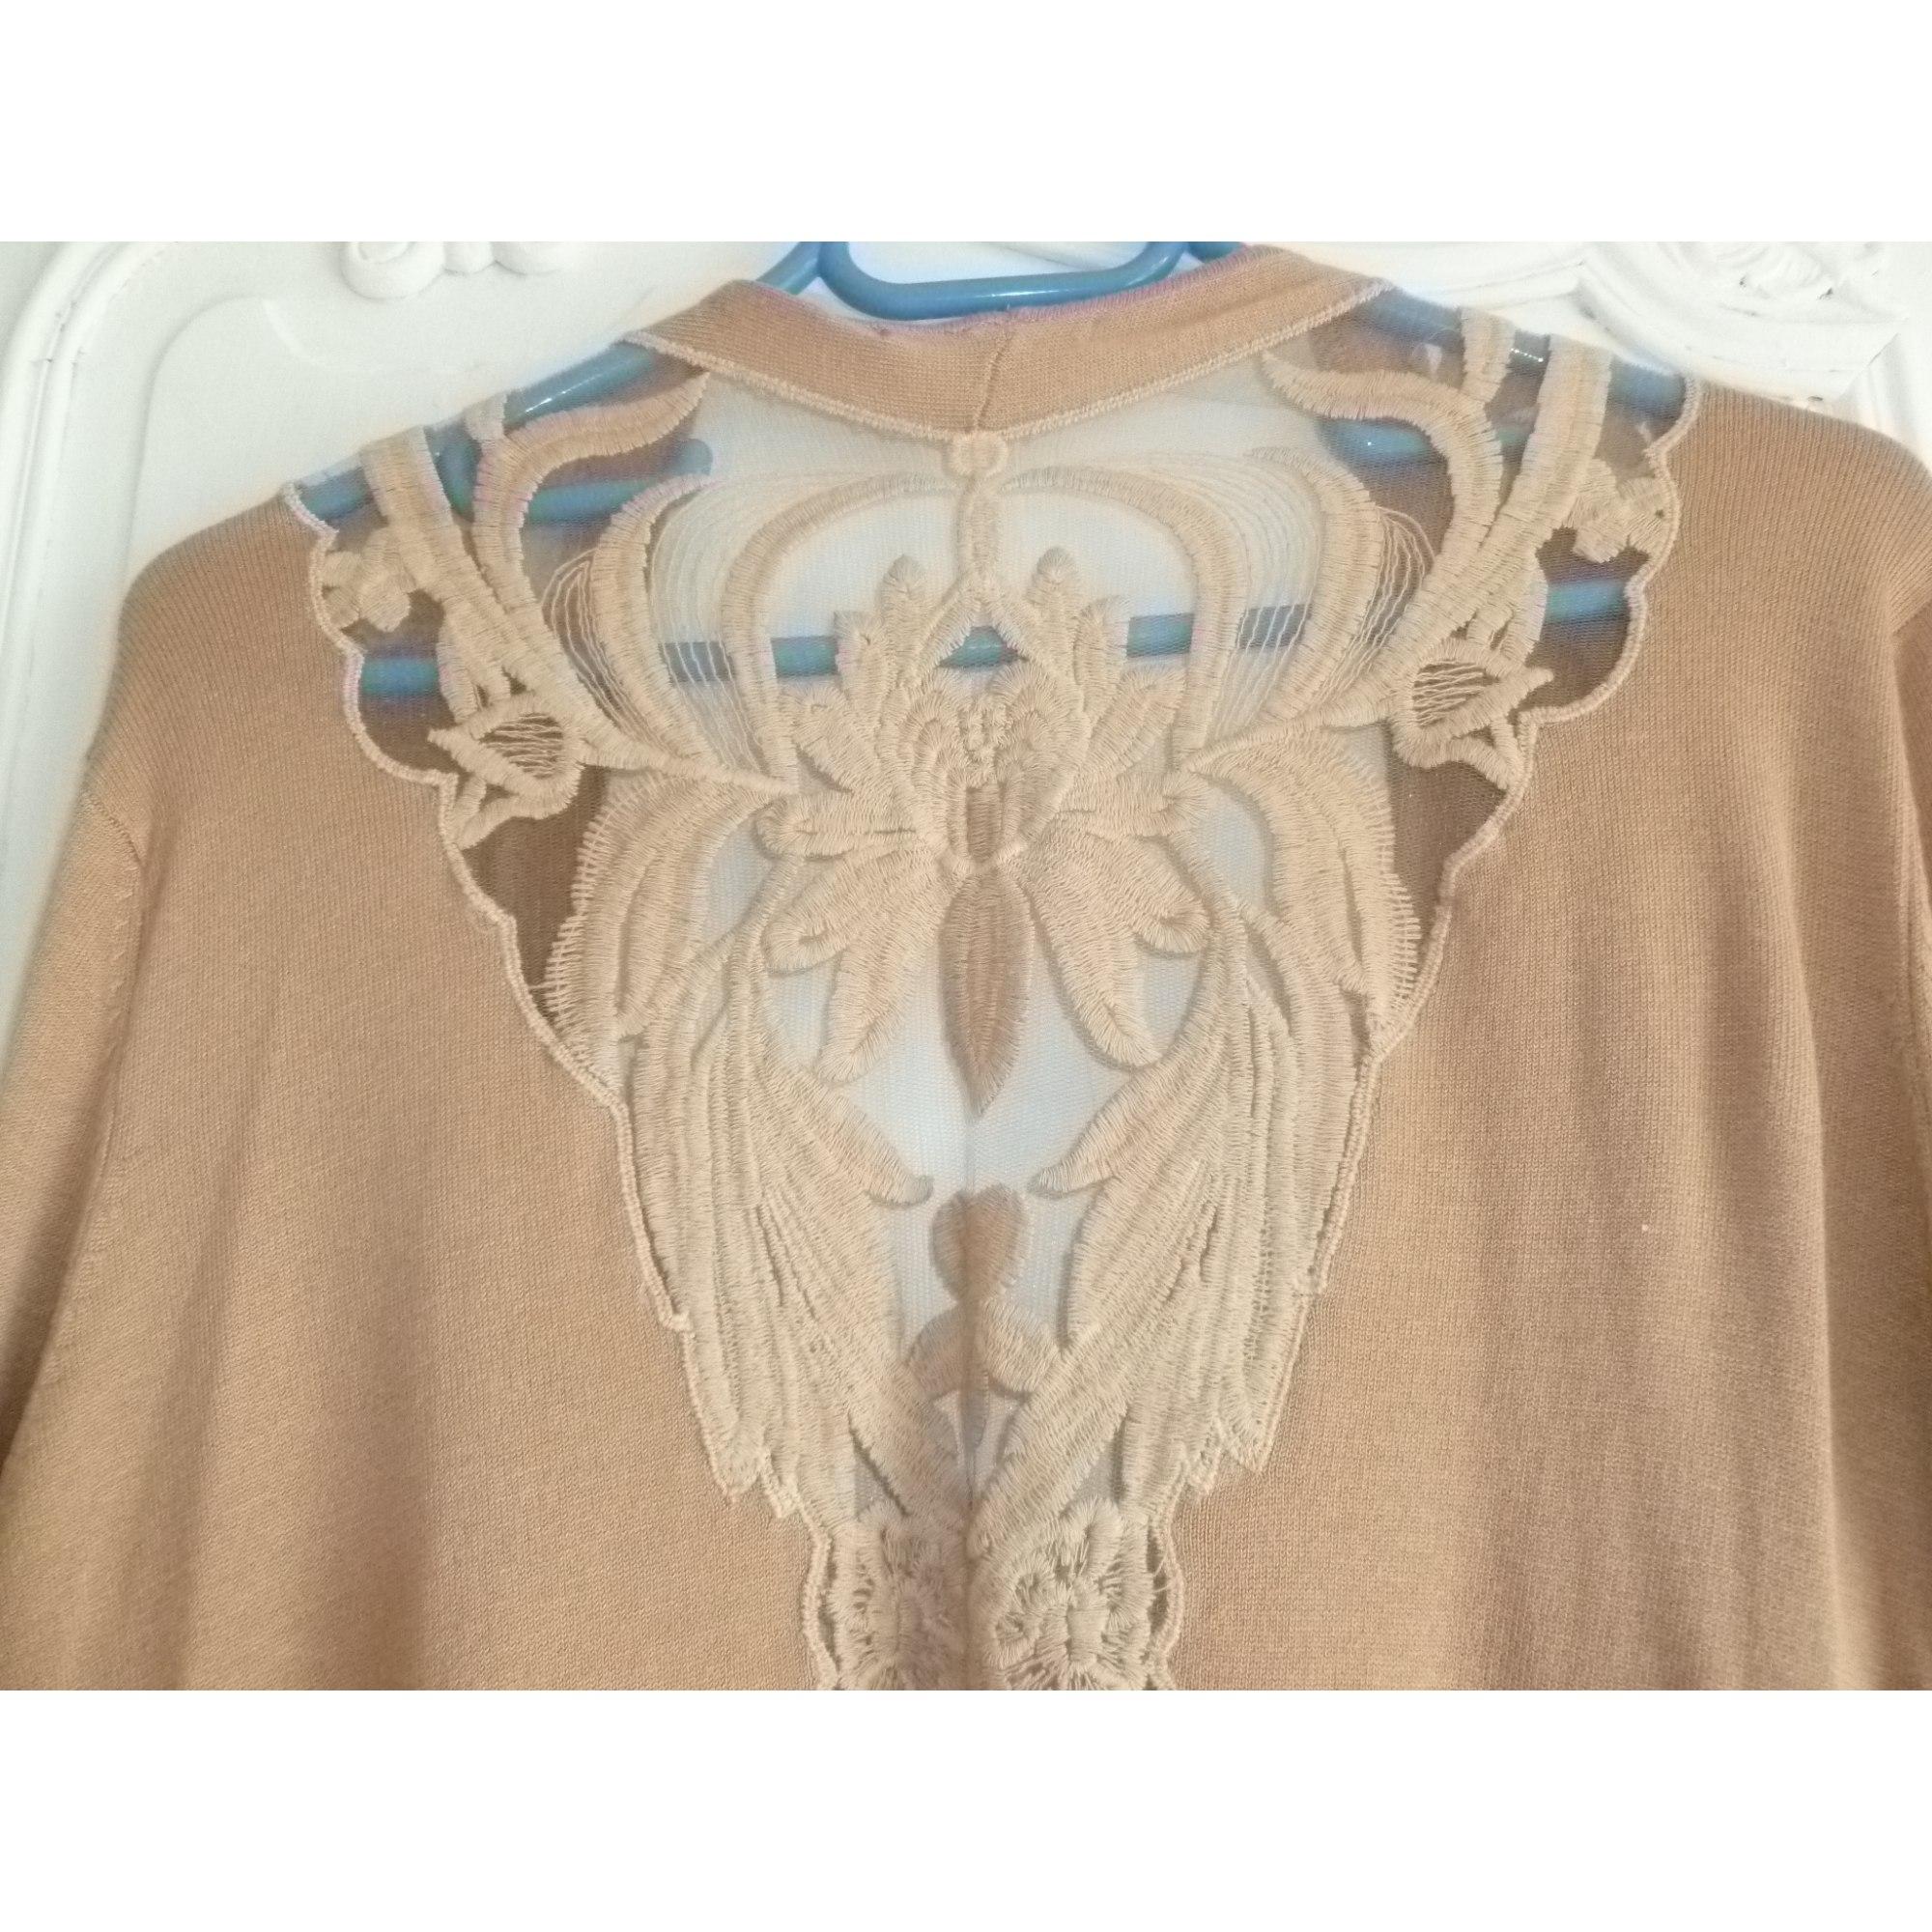 Gilet, cardigan 3 SUISSES Beige, camel